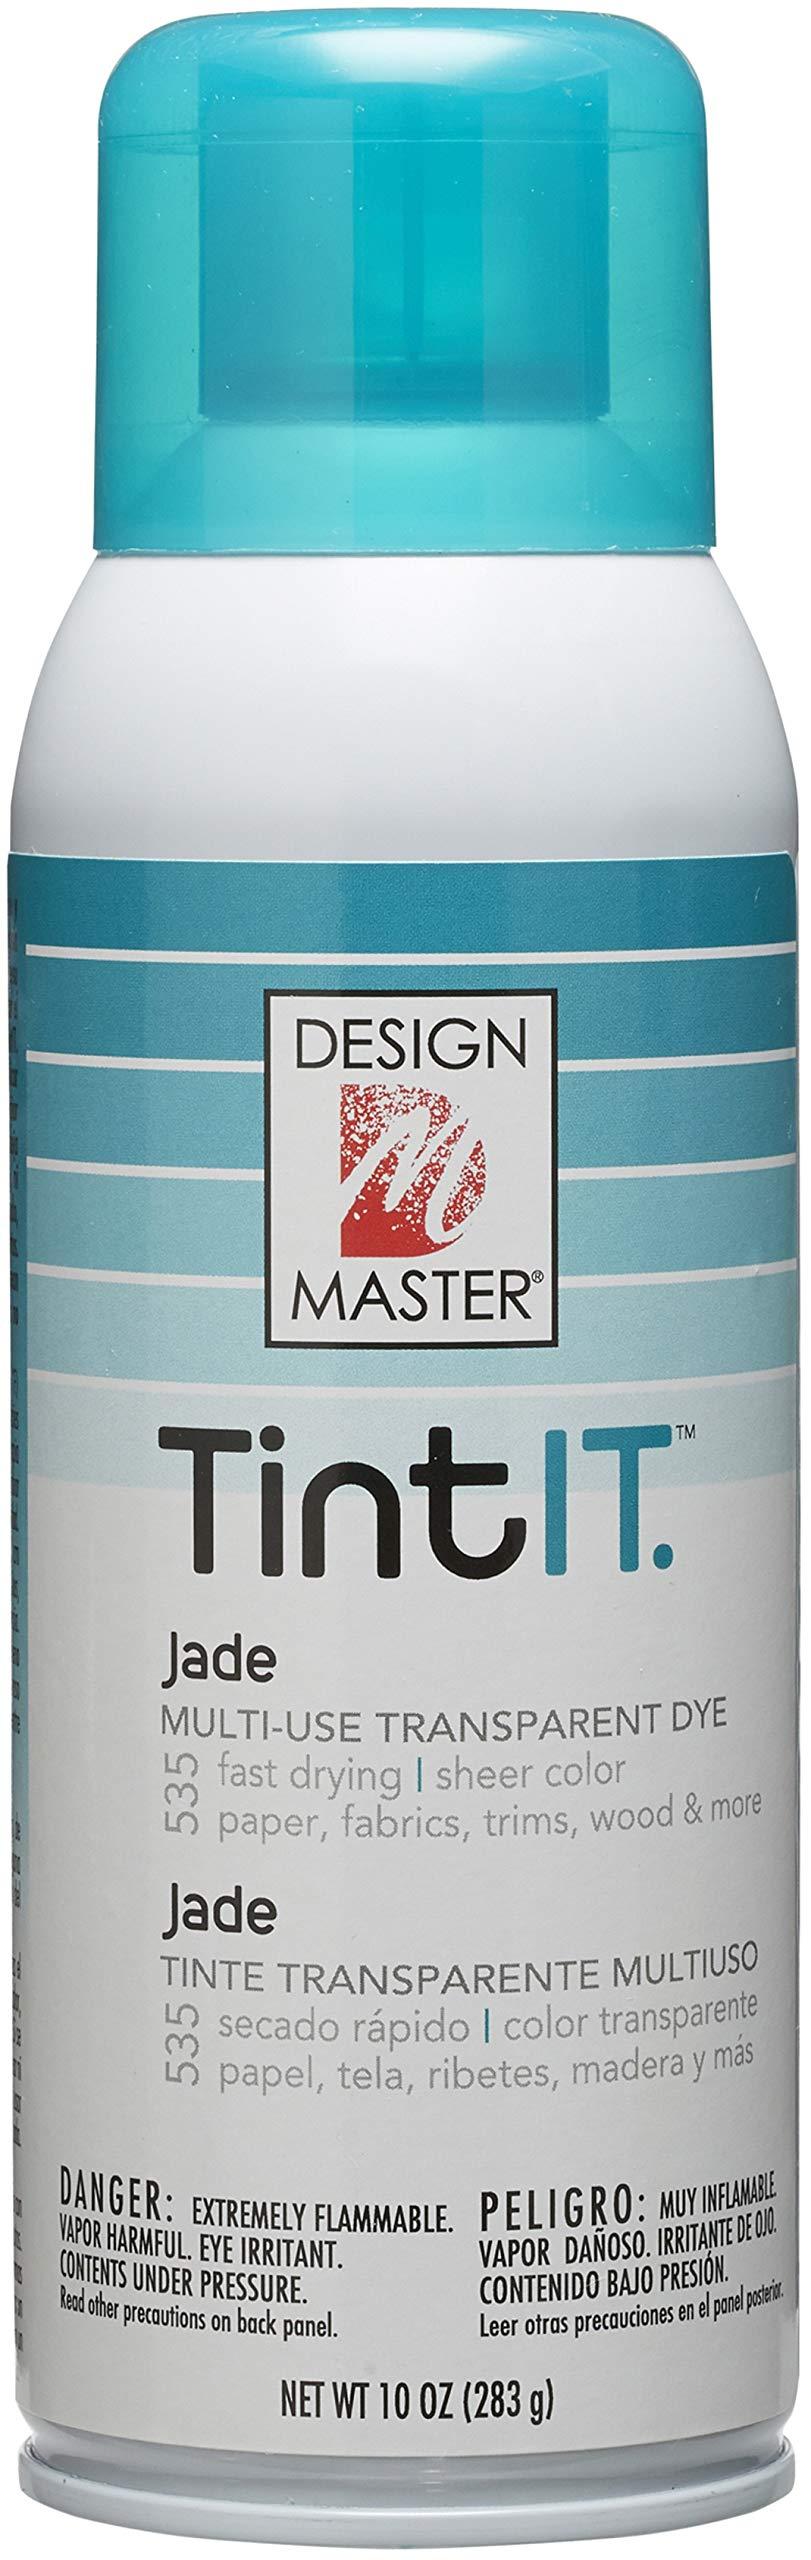 Design Master Tint IT Transparent Dye Spray Paint, 10-Ounce, Jade